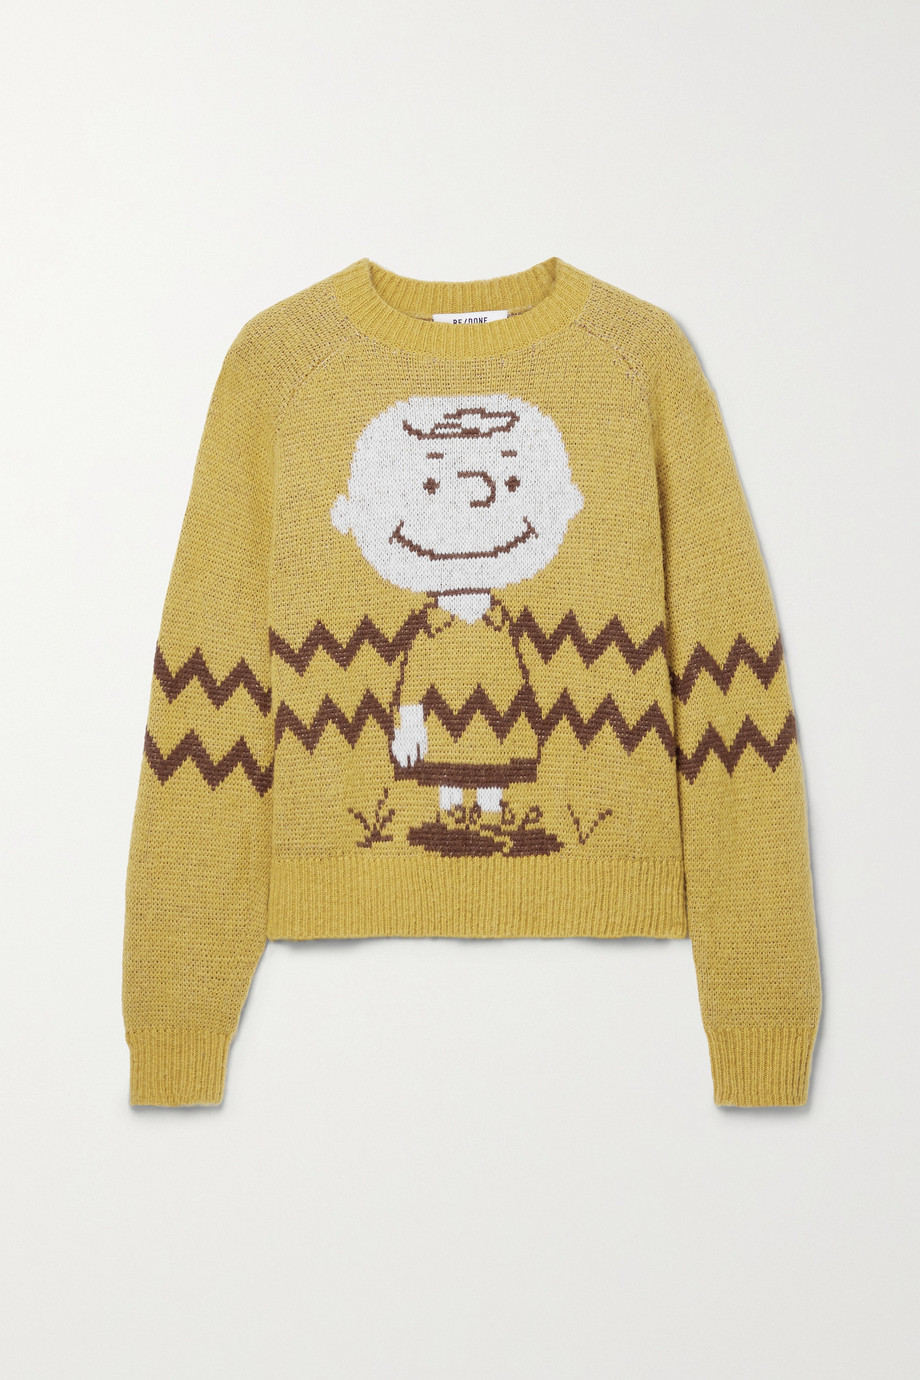 RE/DONE + Peanuts 50s intarsia-knit sweater